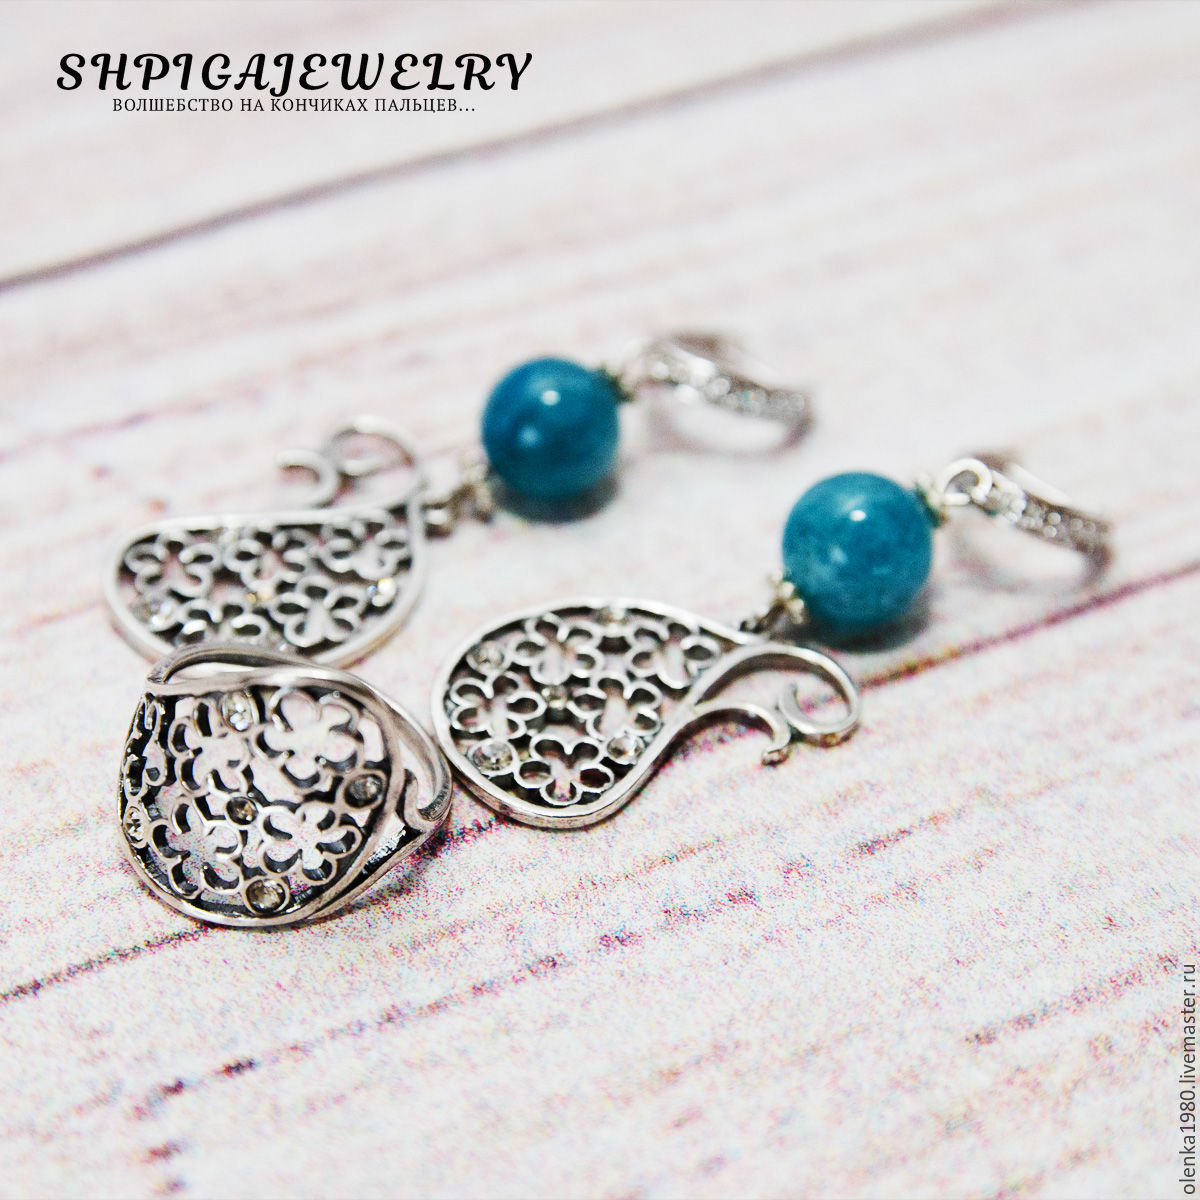 Silver set with aquamarine